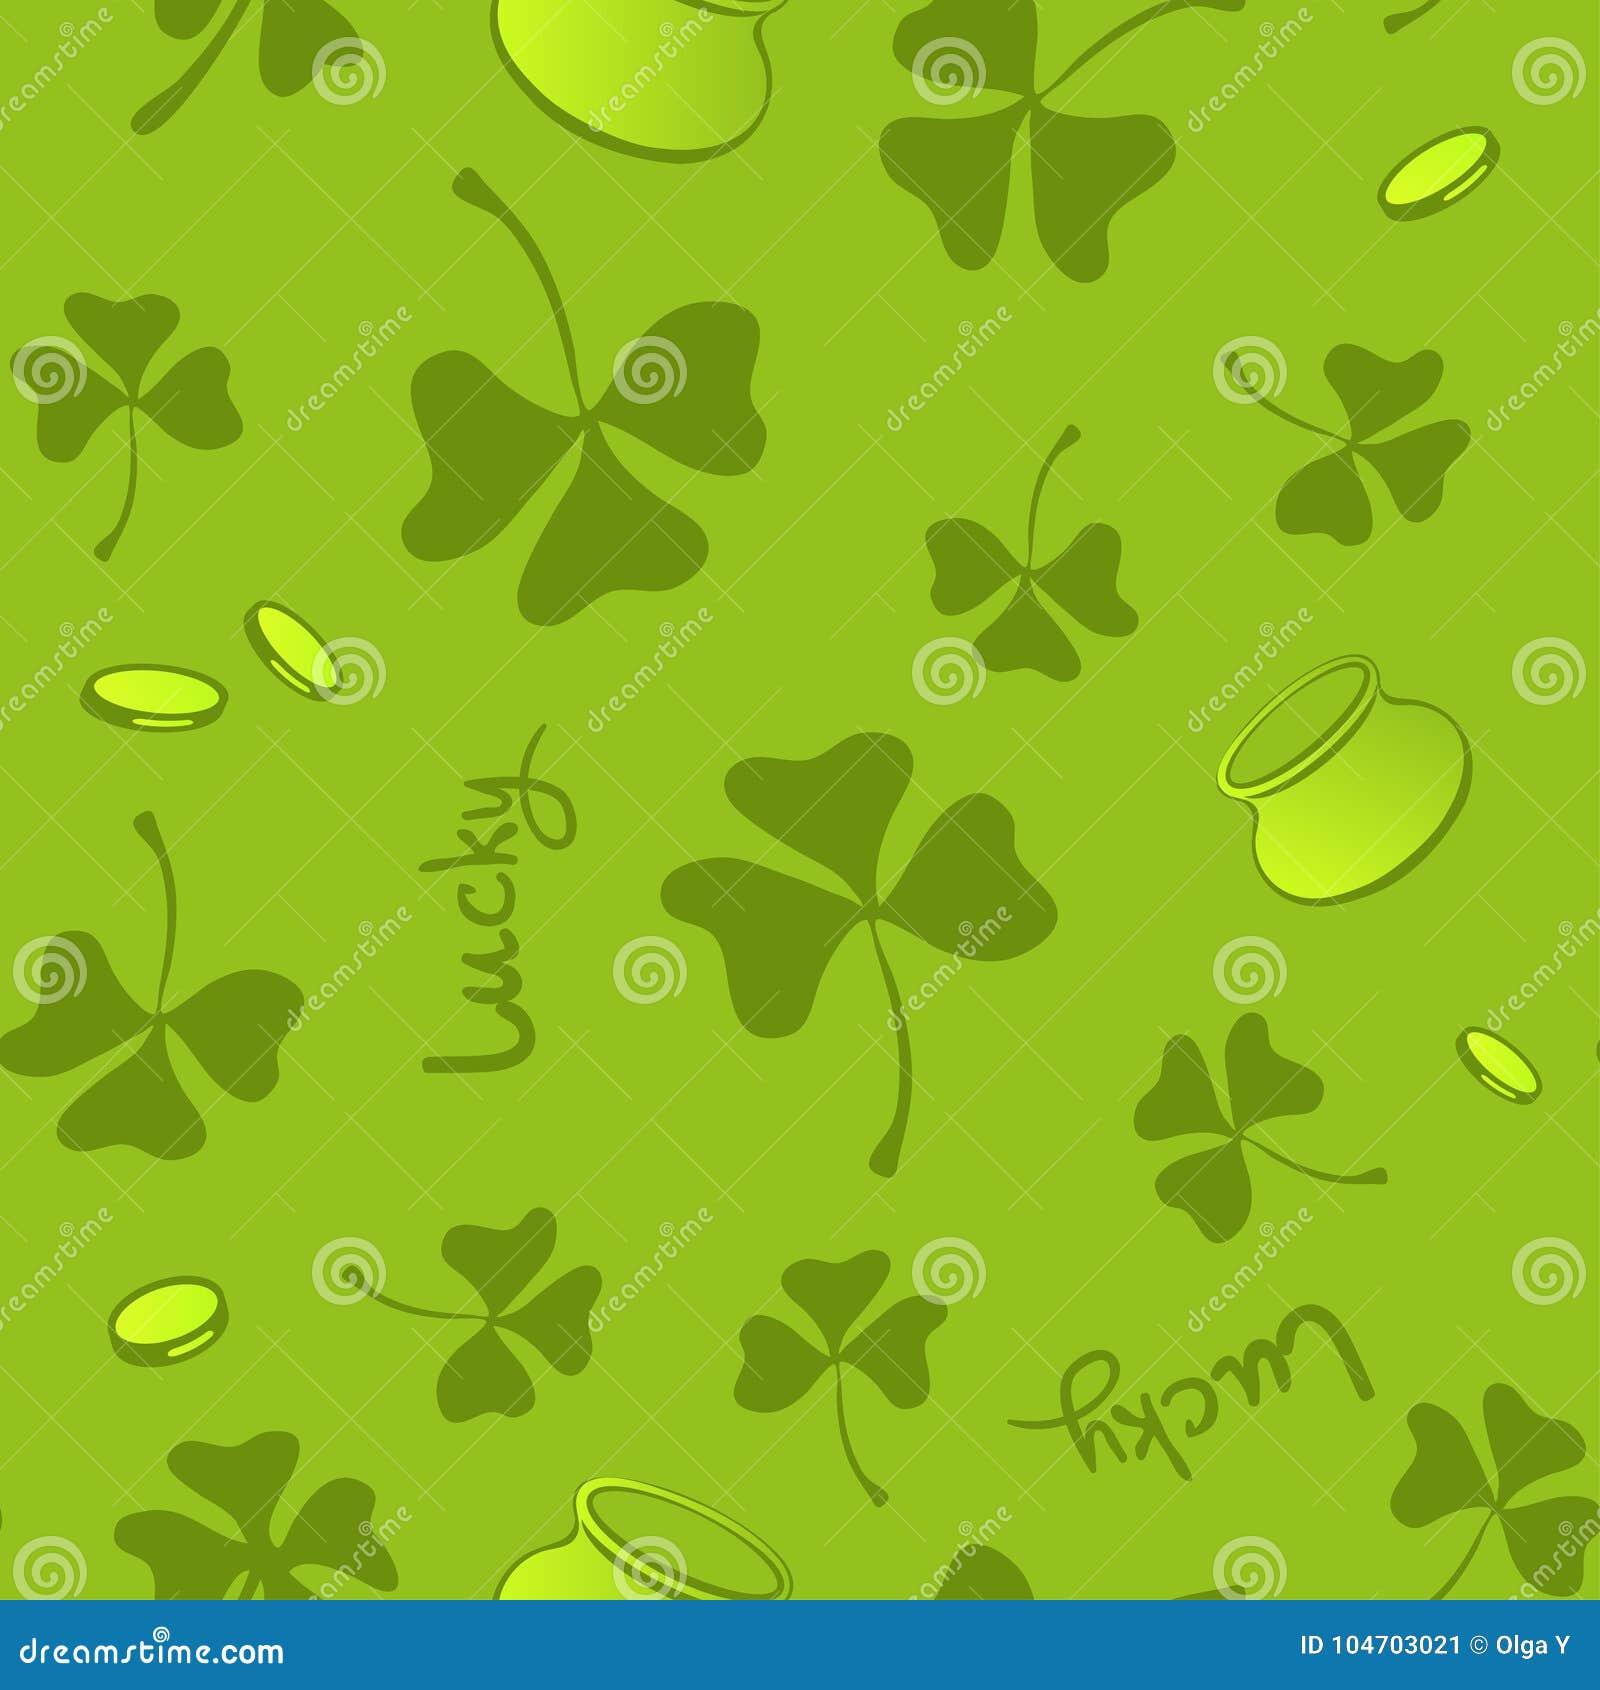 Clover Leaves Seamless Vector Pattern St Patricks Day Green Background Shamrock Wallpaper